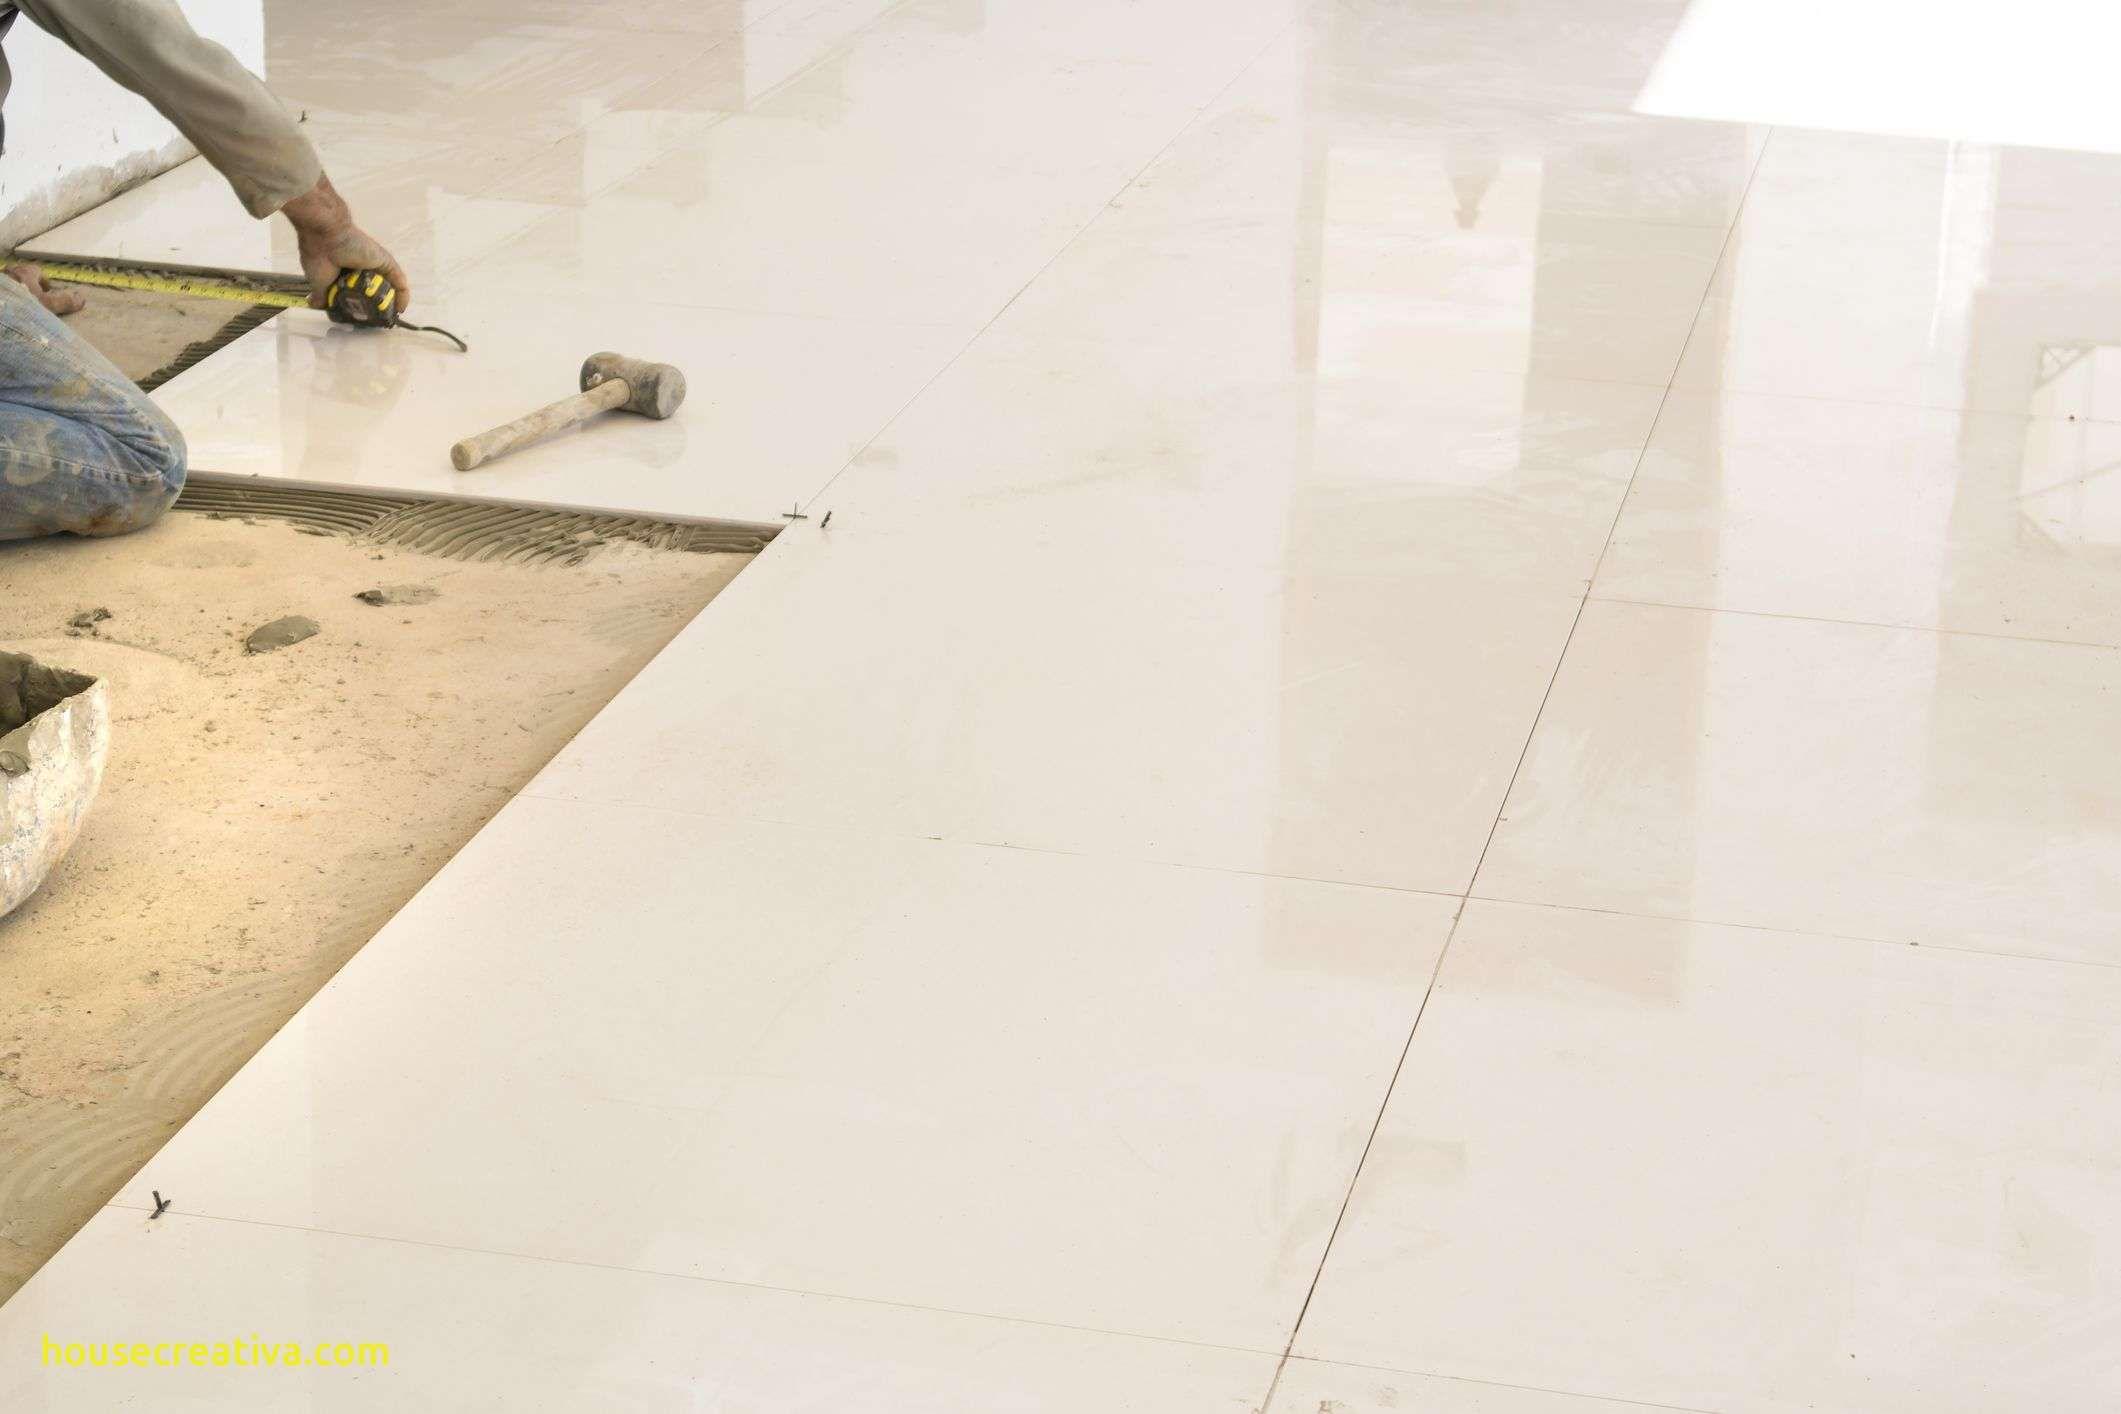 Elegant Ceramic Tile No Grout Lines Homedecoration Homedecorations Homedecorationideas Porcelain Flooring Porcelain Vs Ceramic Tile Porcelain Floor Tiles